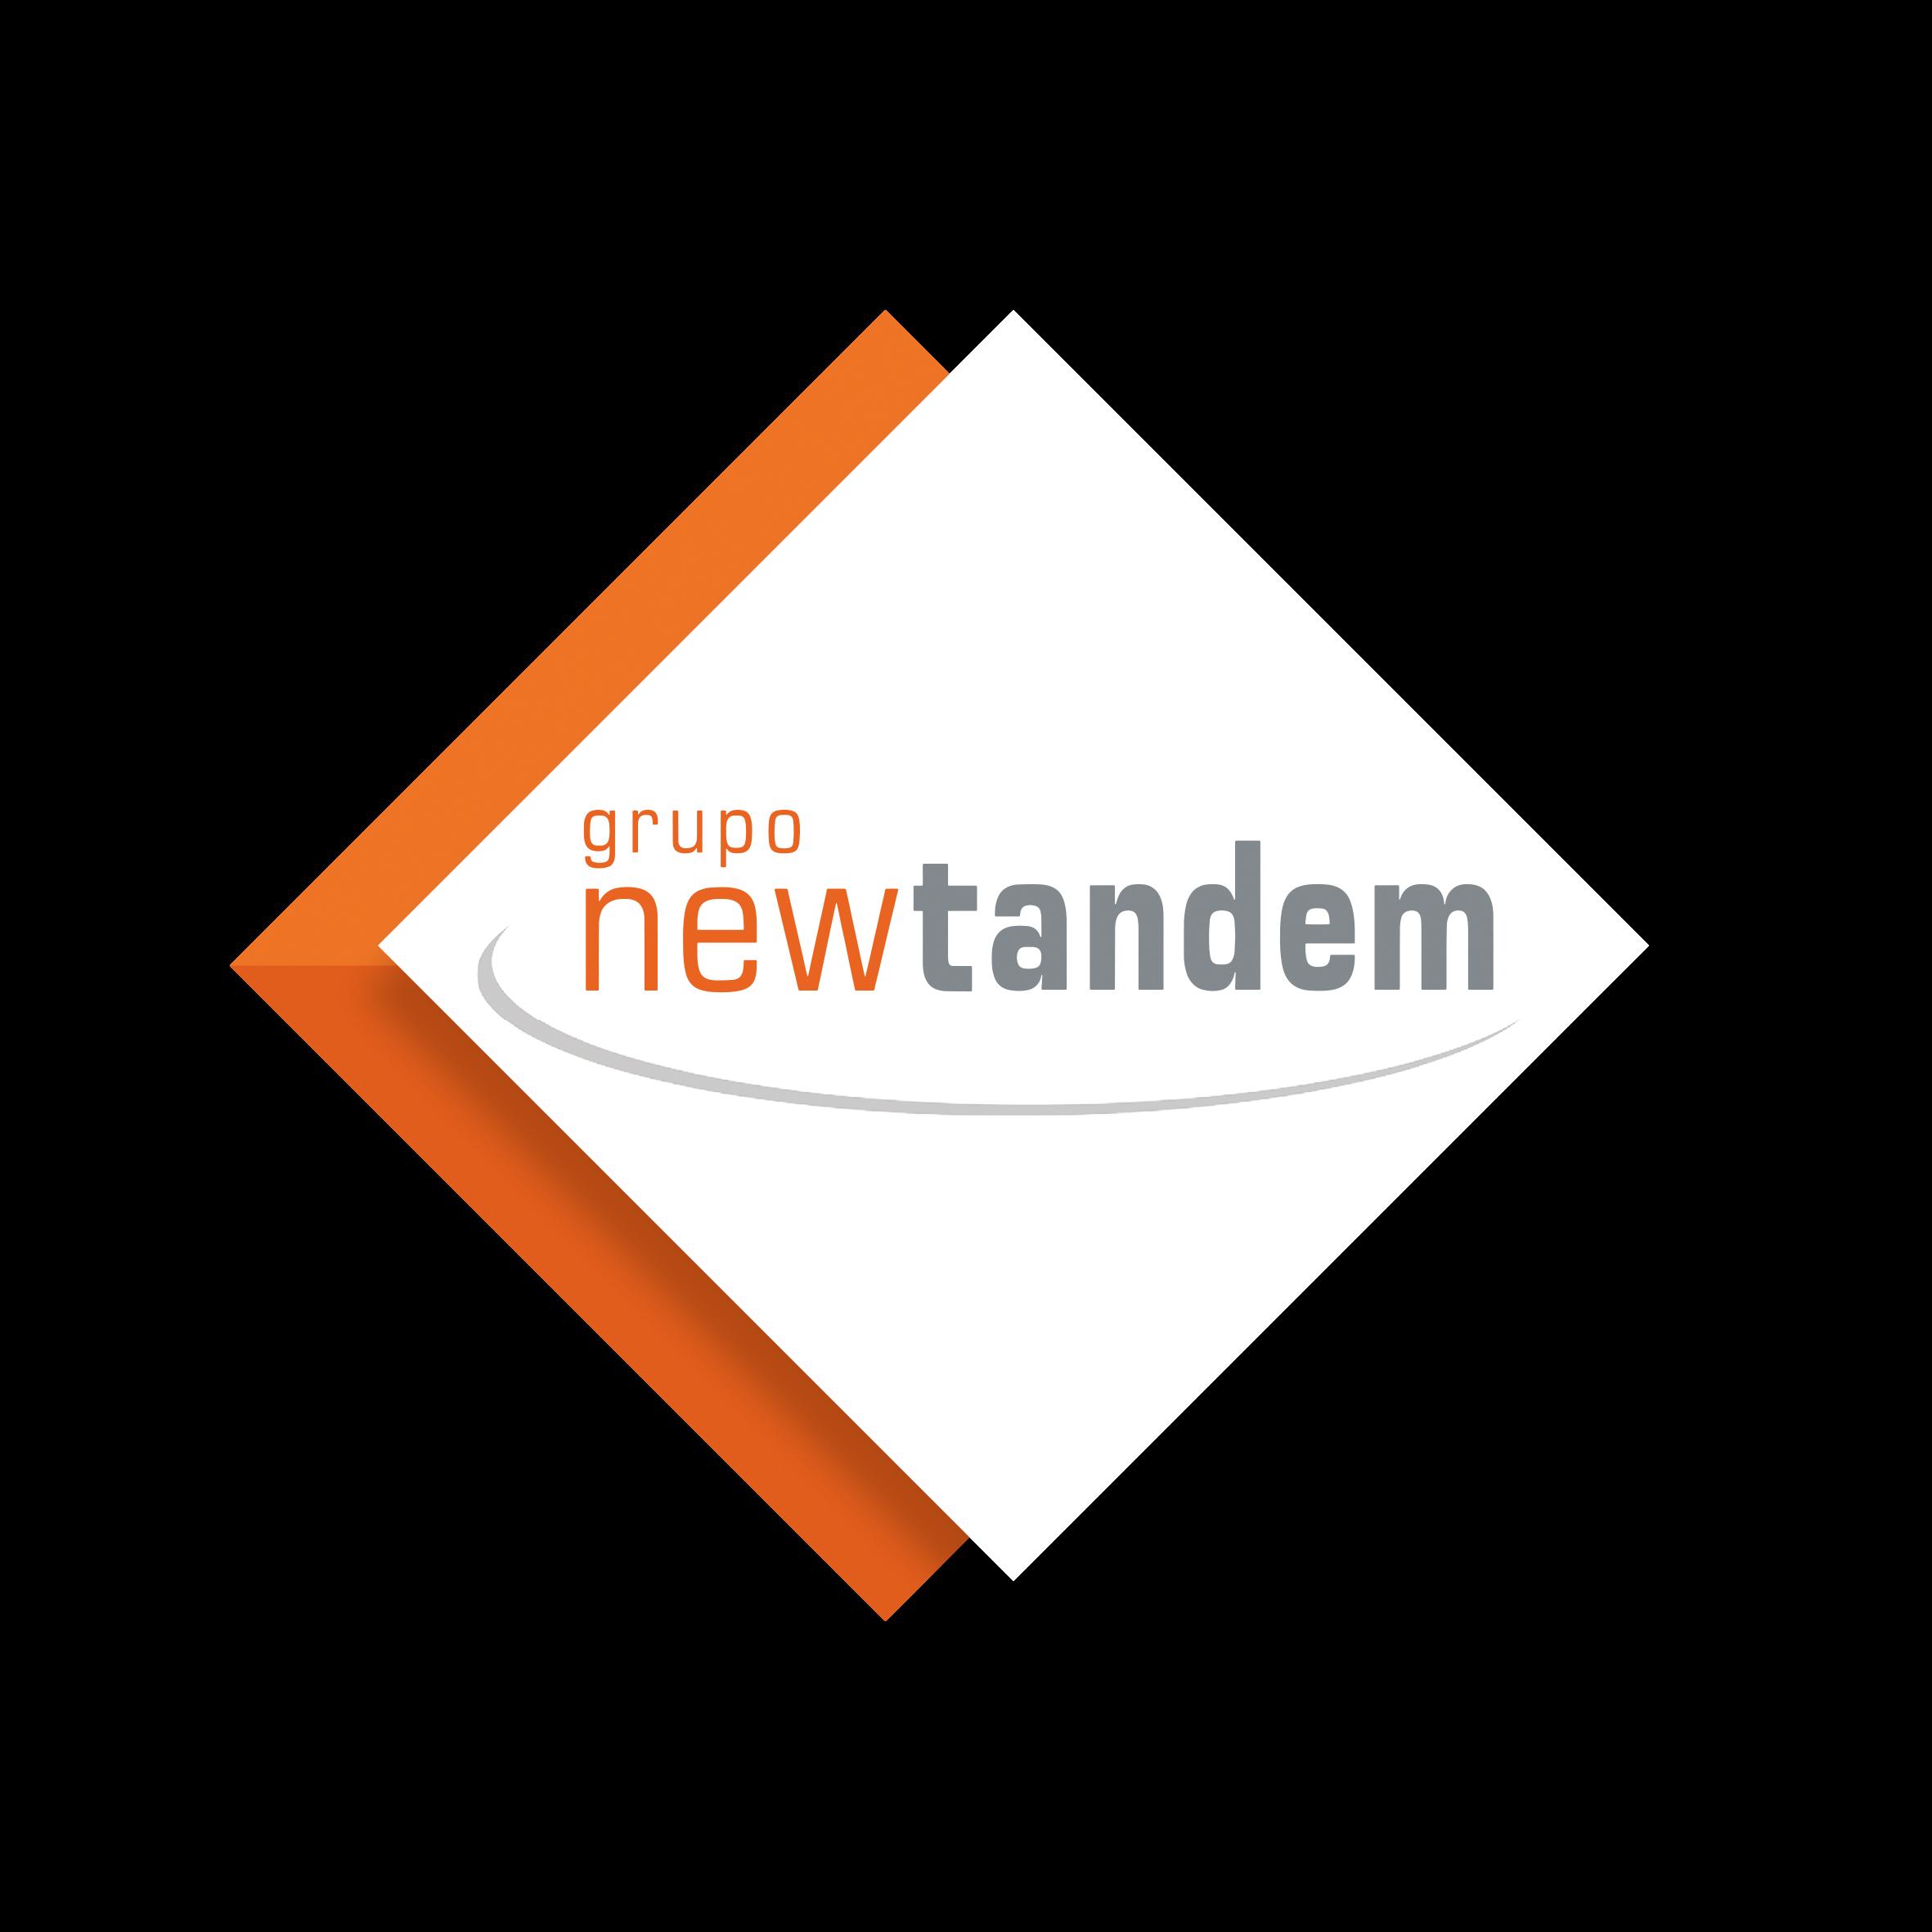 New Tandem